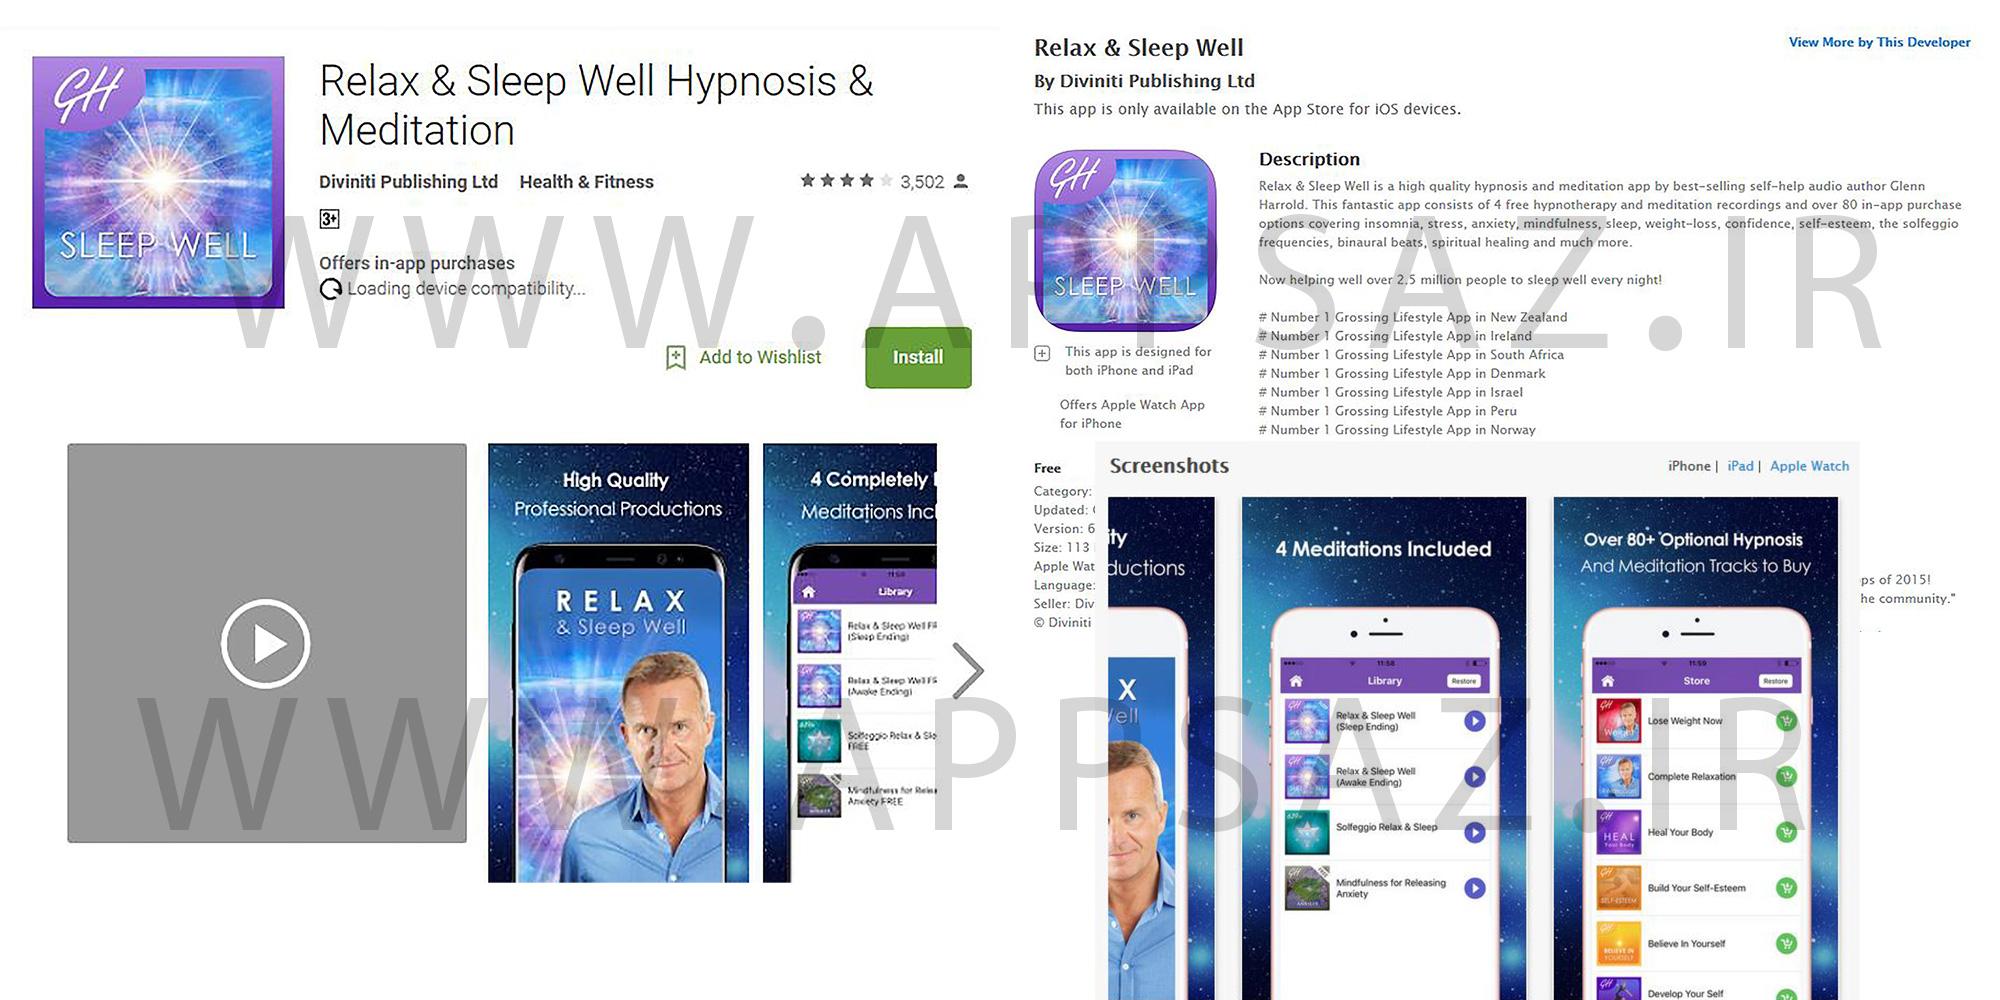 Relax & Sleep Well Hypnosis & Meditation